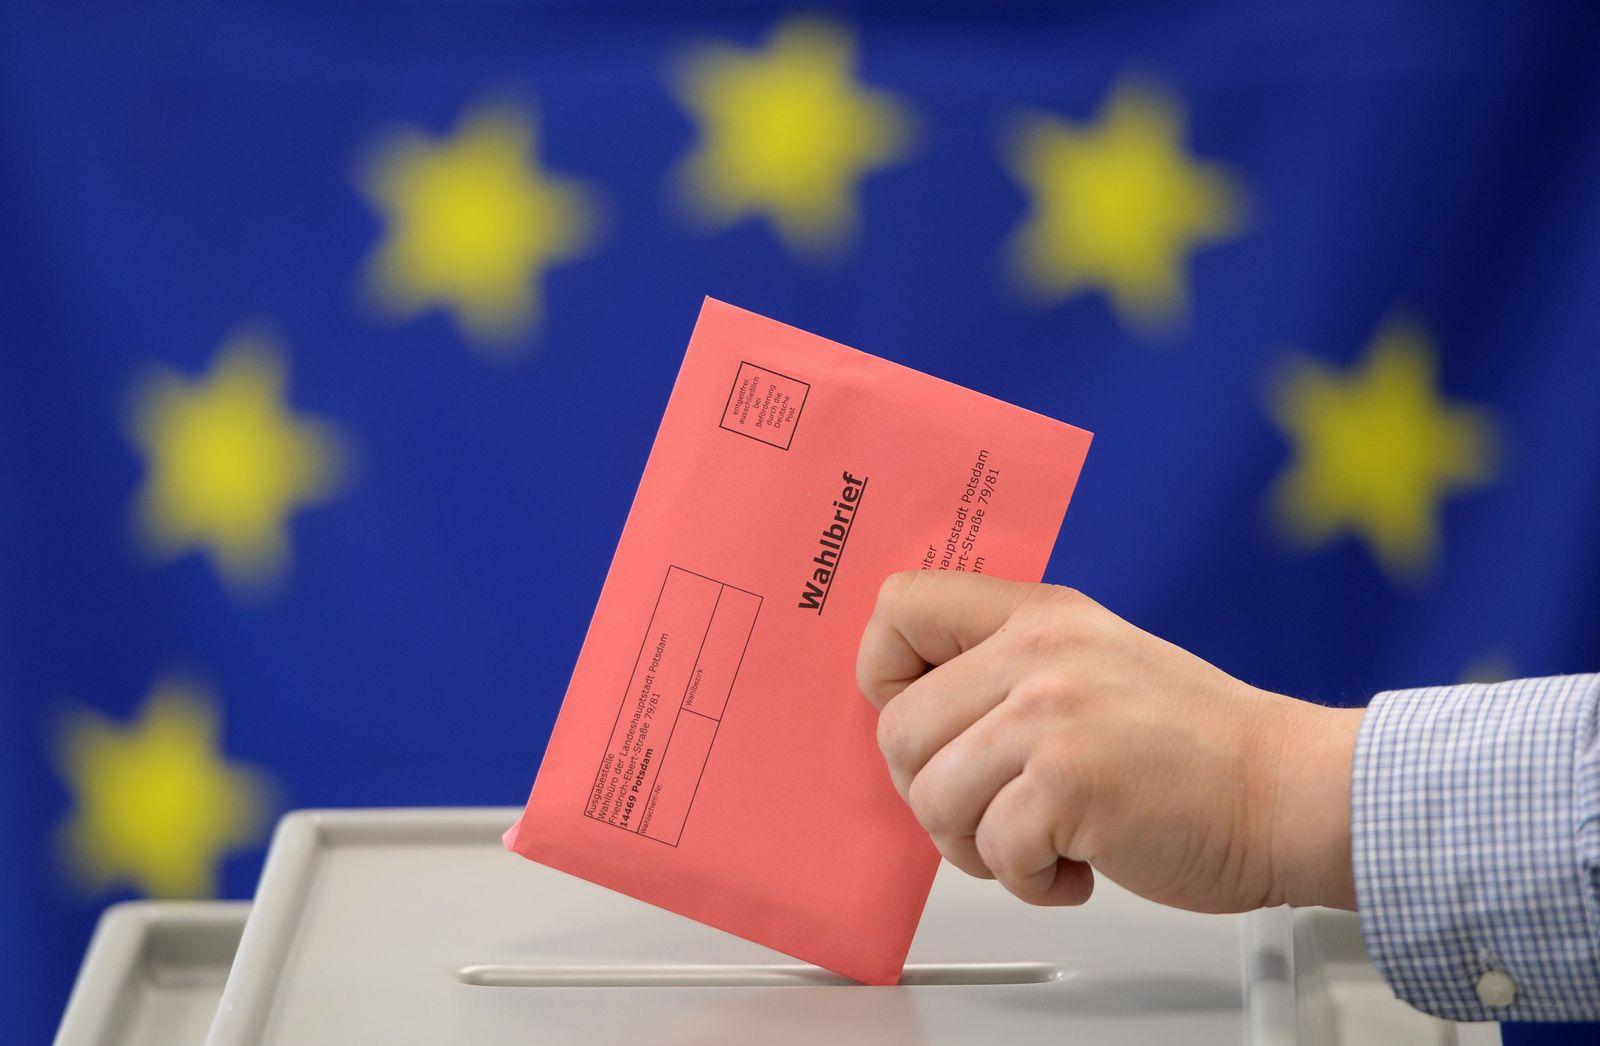 Europa-Wahl/ Wahlbrief